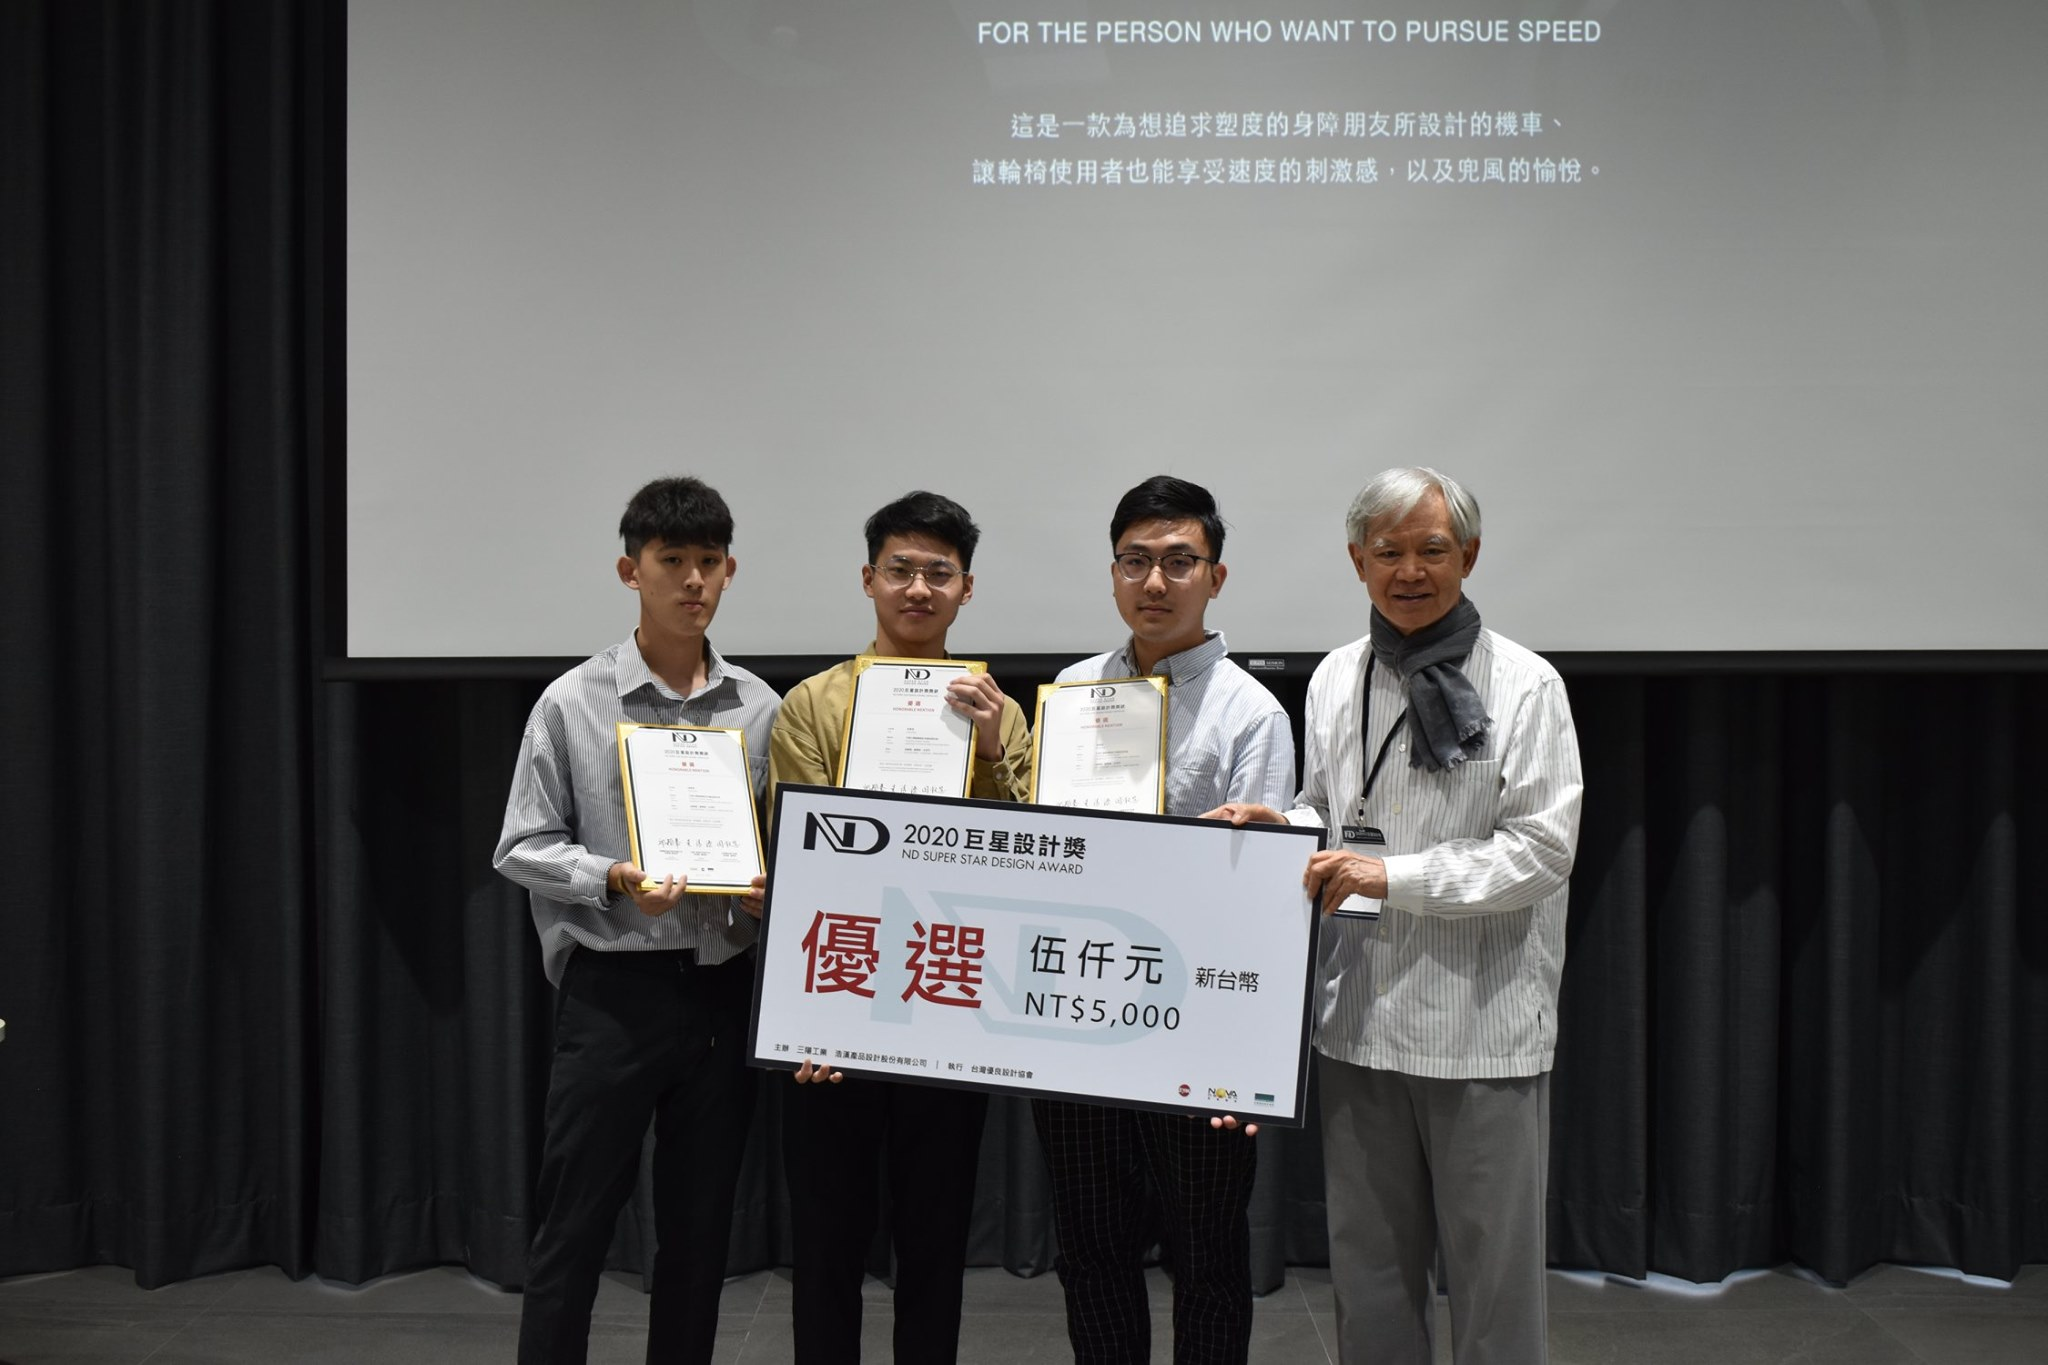 2020「ND巨星設計獎」,中原「追風者」團隊榮獲優選。(圖右為台灣設計研究院張光民總顧問,為本次競賽評審之一).jpg